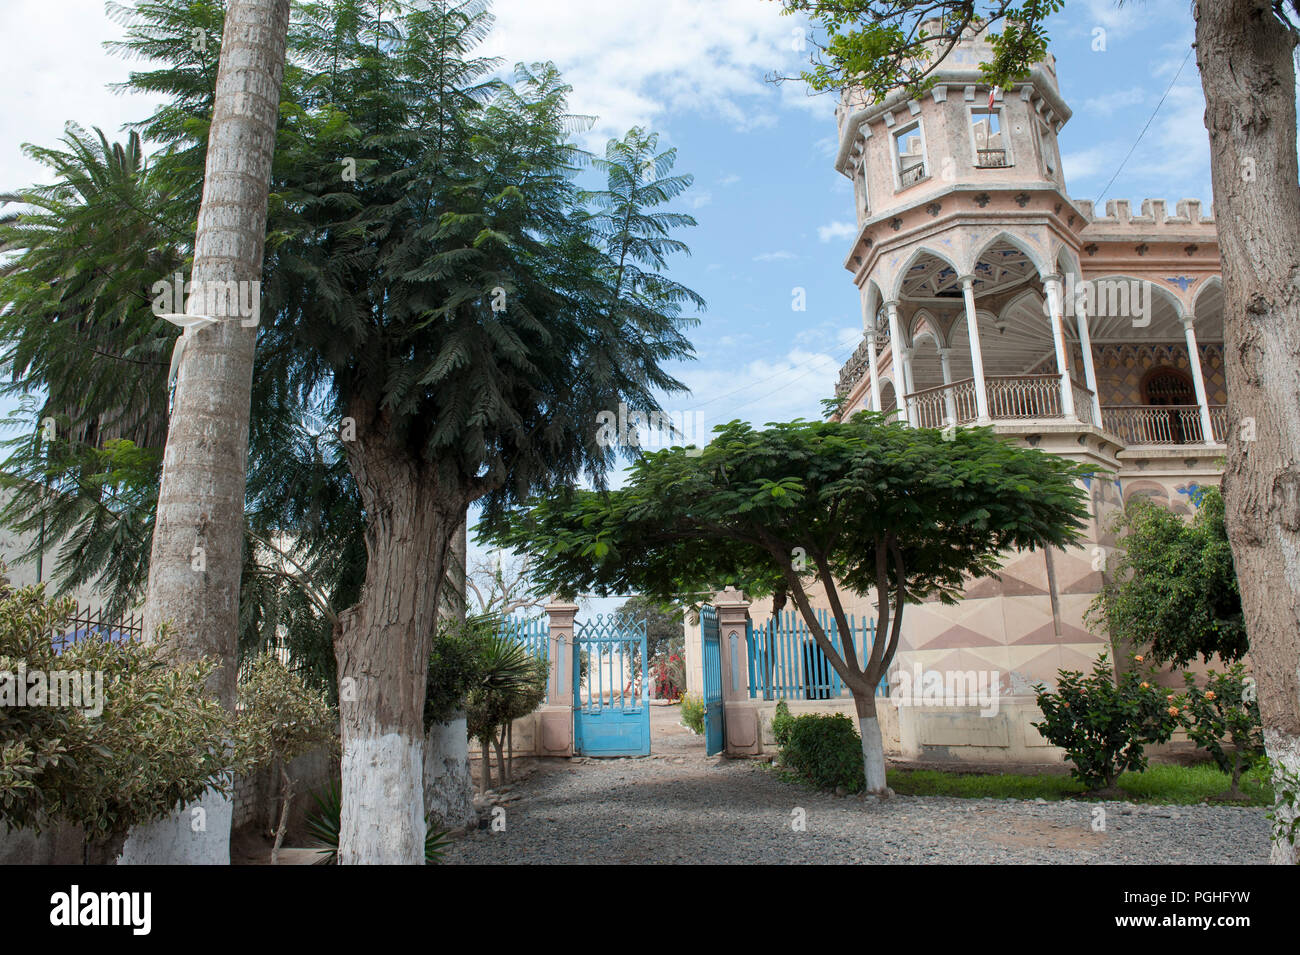 Beautiful view of the castle of San Vicente de Ca ete, Lima. - Stock Image